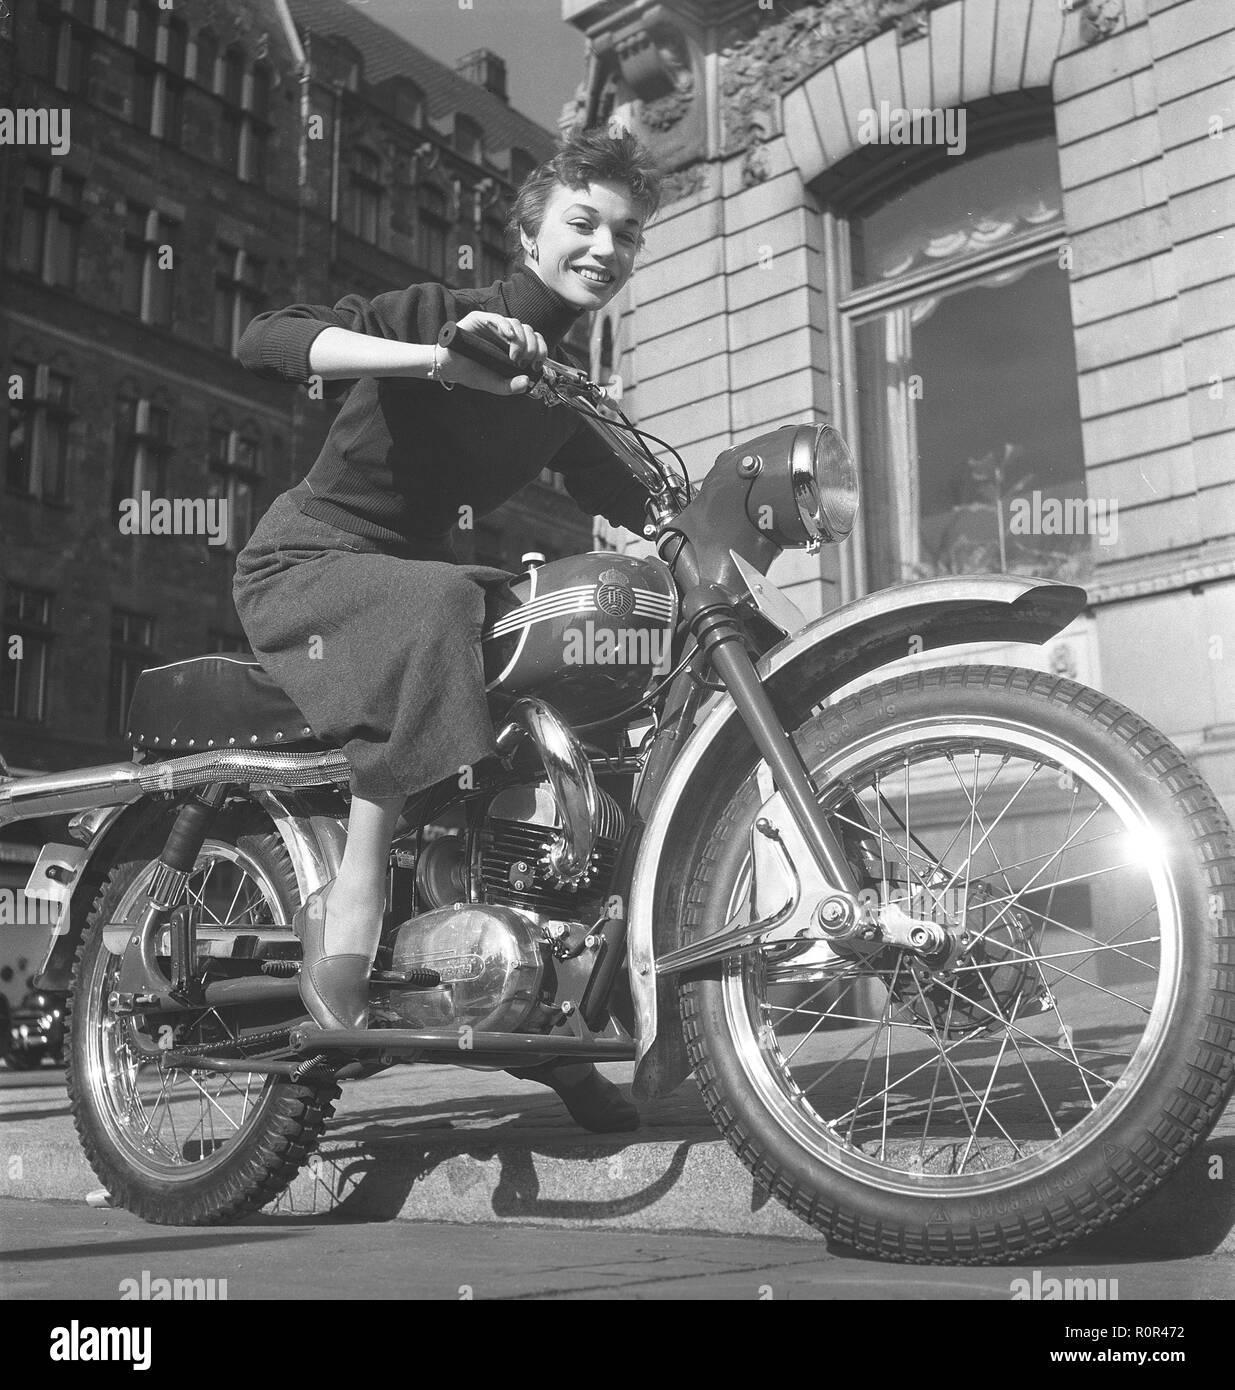 Margit Carlqvist , swedish actress, born 1932, pictured here on a Husqvarna motorcycle model 281 sport, 1954. Photo Kristoffersson Ref BO53-6 - Stock Image